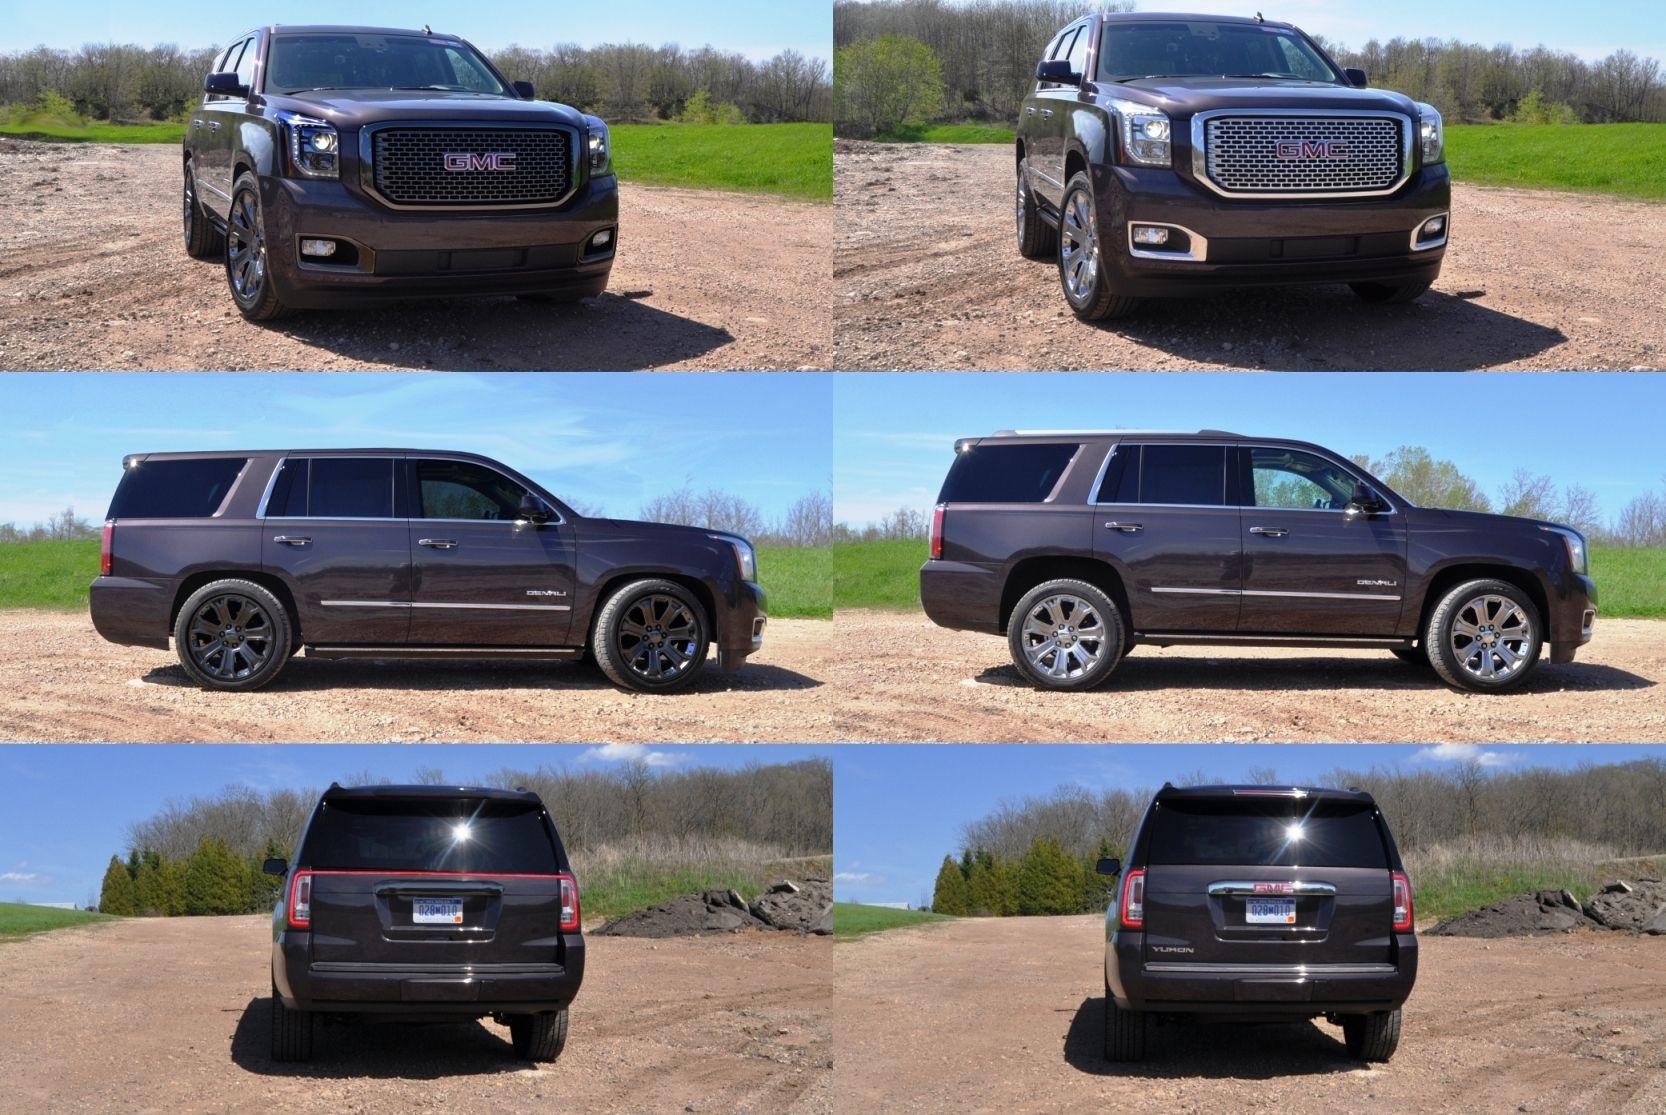 Car Revs Daily.com Future SUV Rendering 2016 GMC Denali VIP Concept 15 800x535 photo